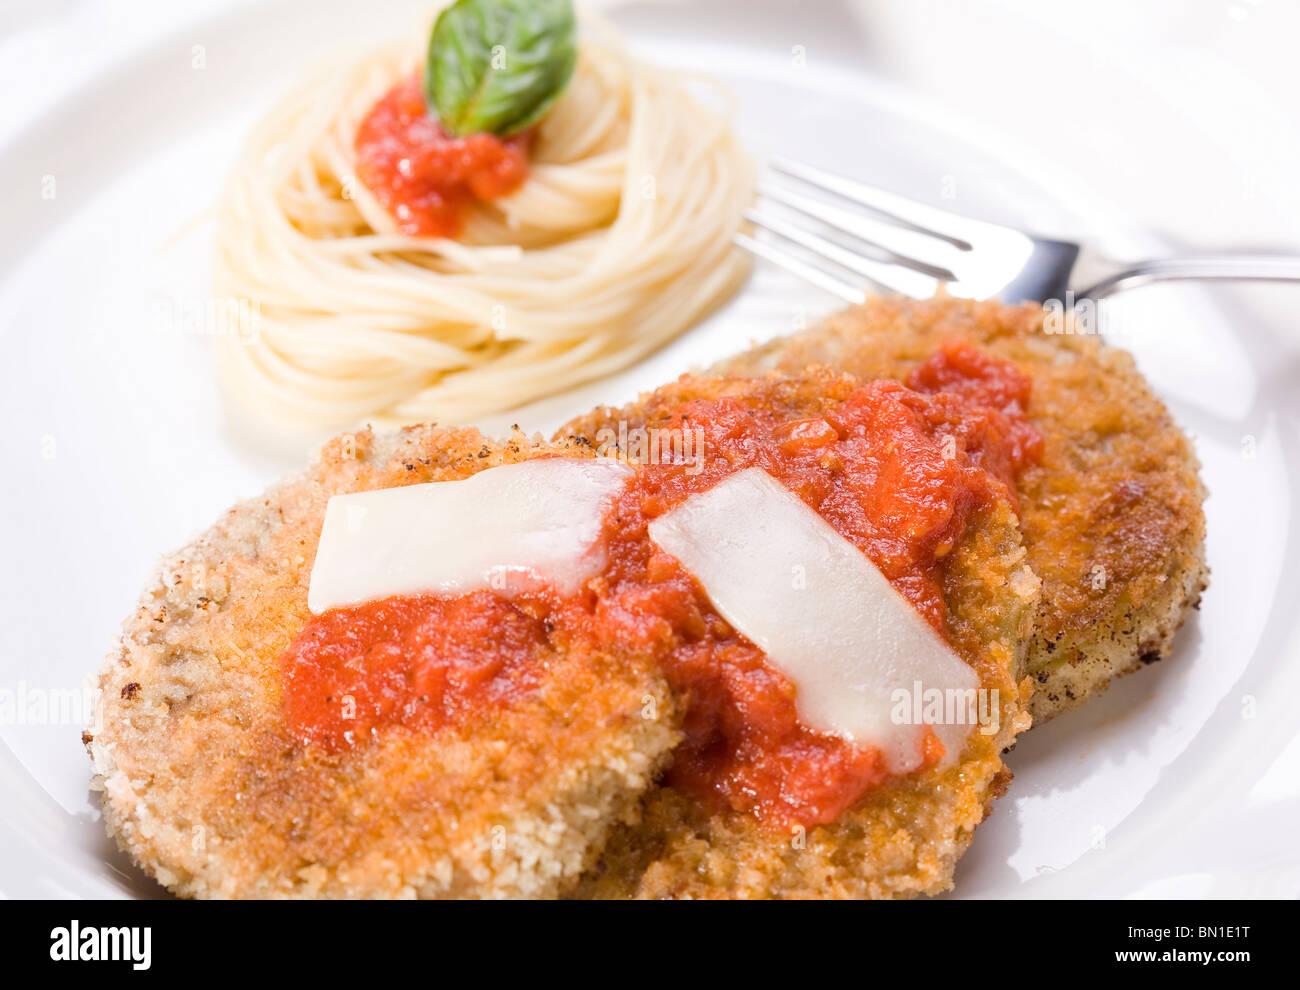 Vegan Eggplant Parmesan with Angel Hair Pasta and Marinara Sauce Stock Photo